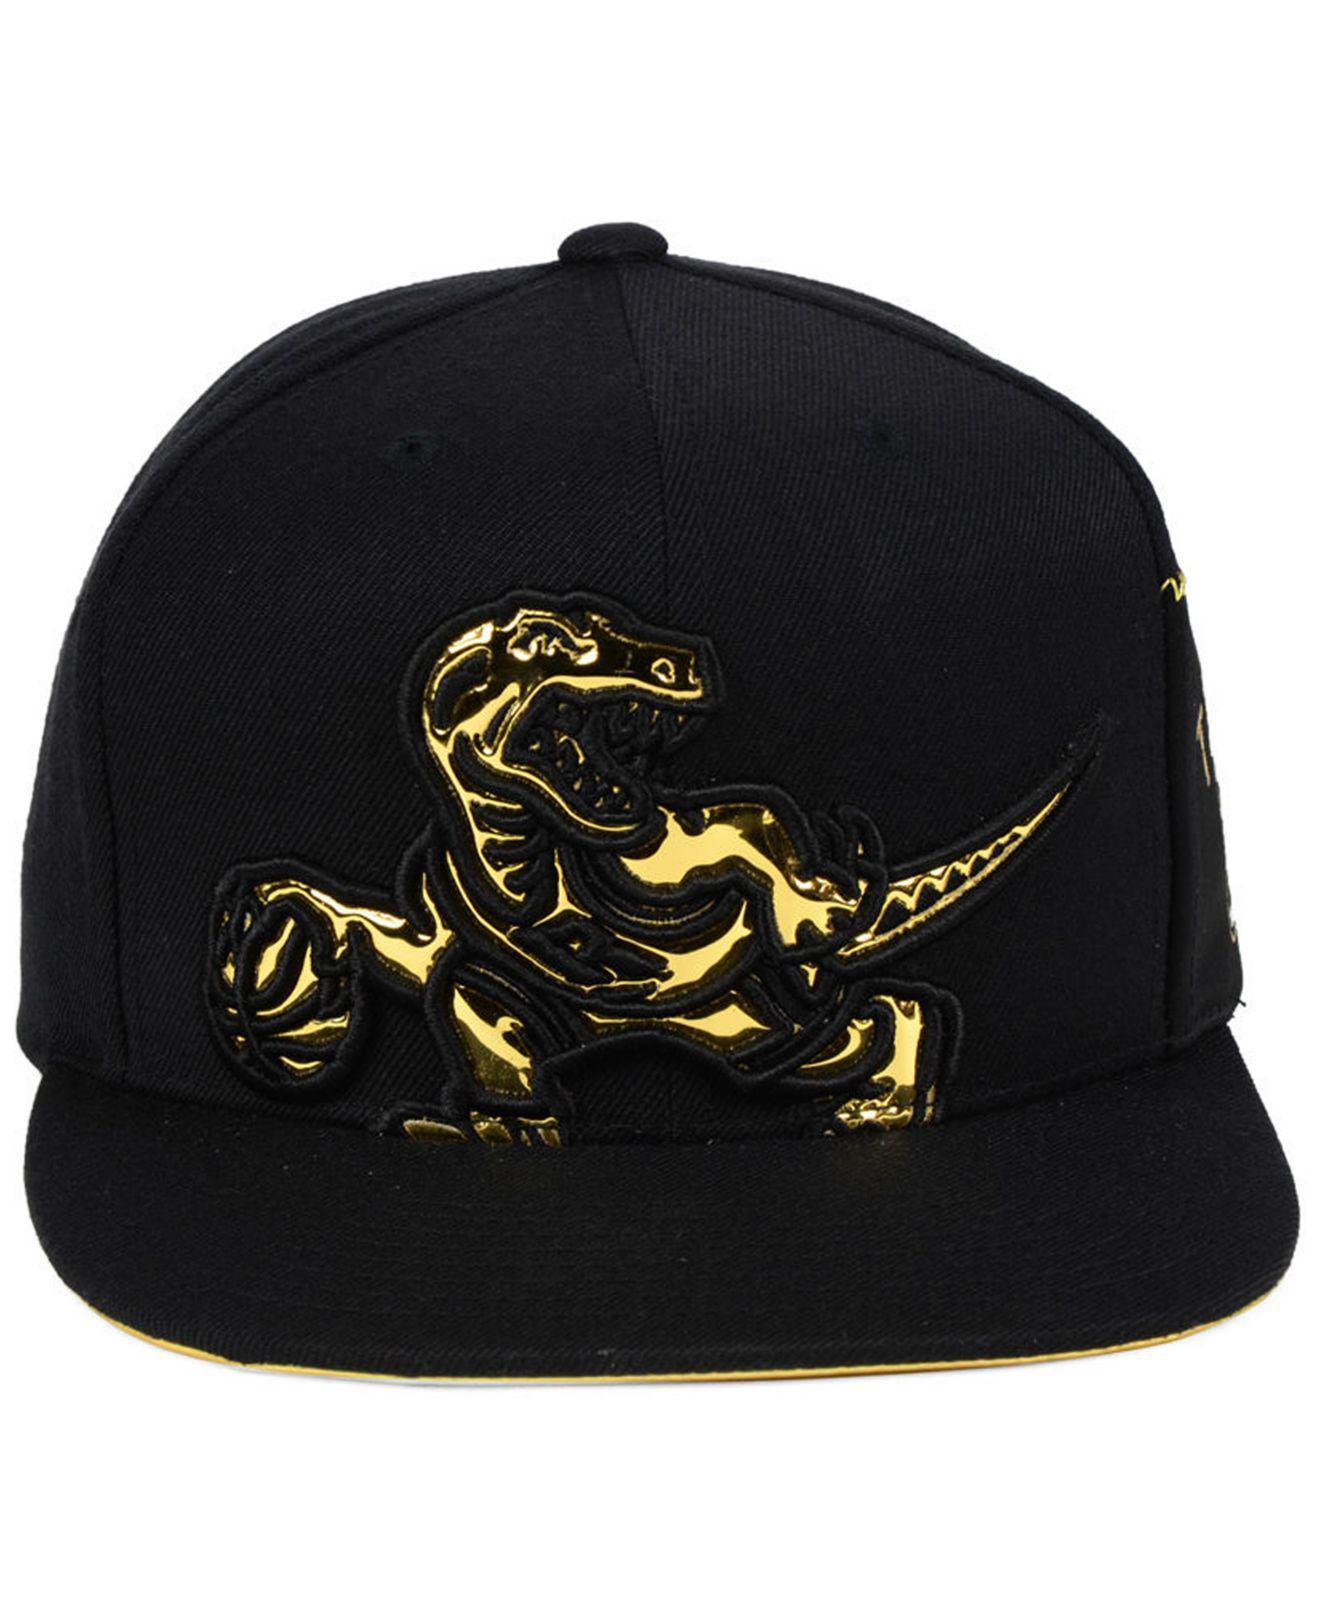 b7a7d7d43a794 Mitchell & Ness Black Toronto Raptors Patent Cropped Snapback Cap for men